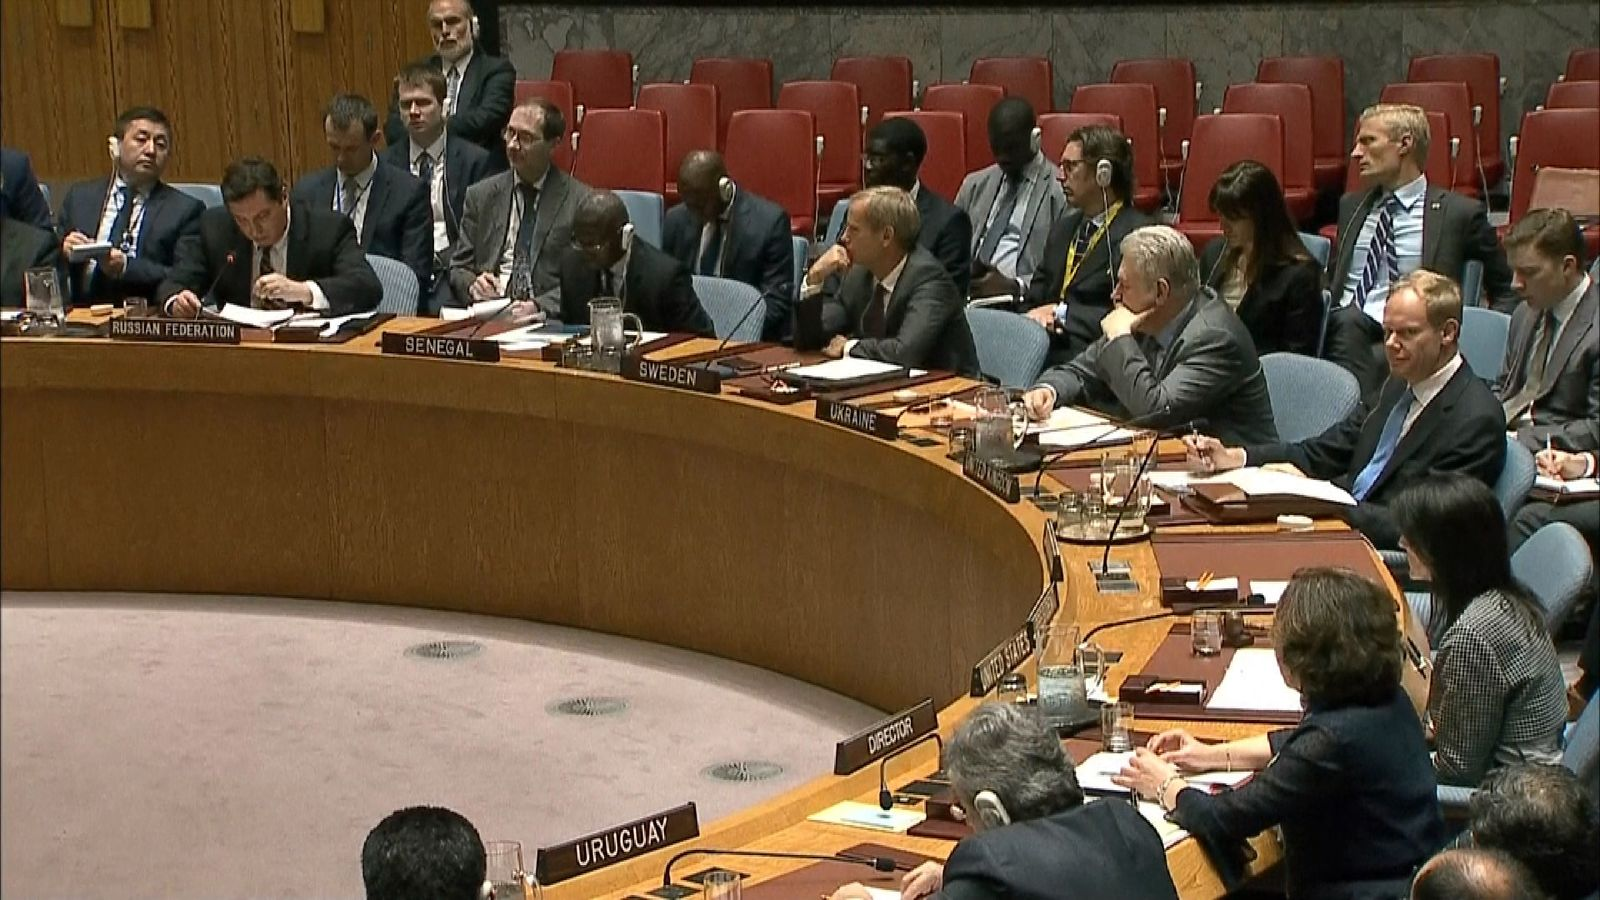 UN delegations discuss the Syria crisis